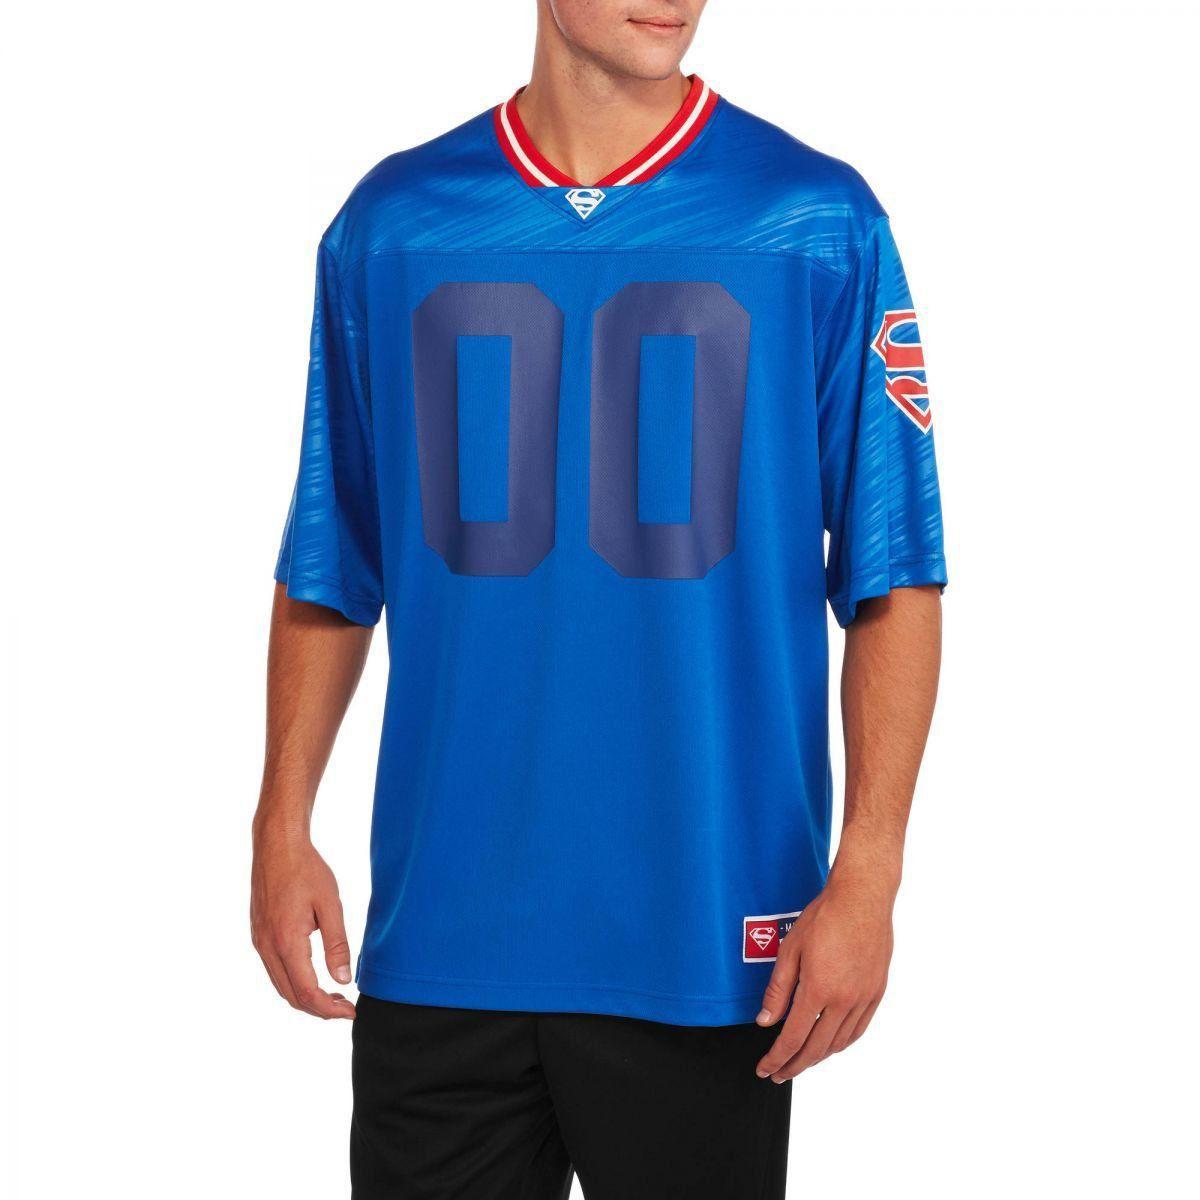 Camiseta Superman Futebol Americano (Football Jersey): DC Comics